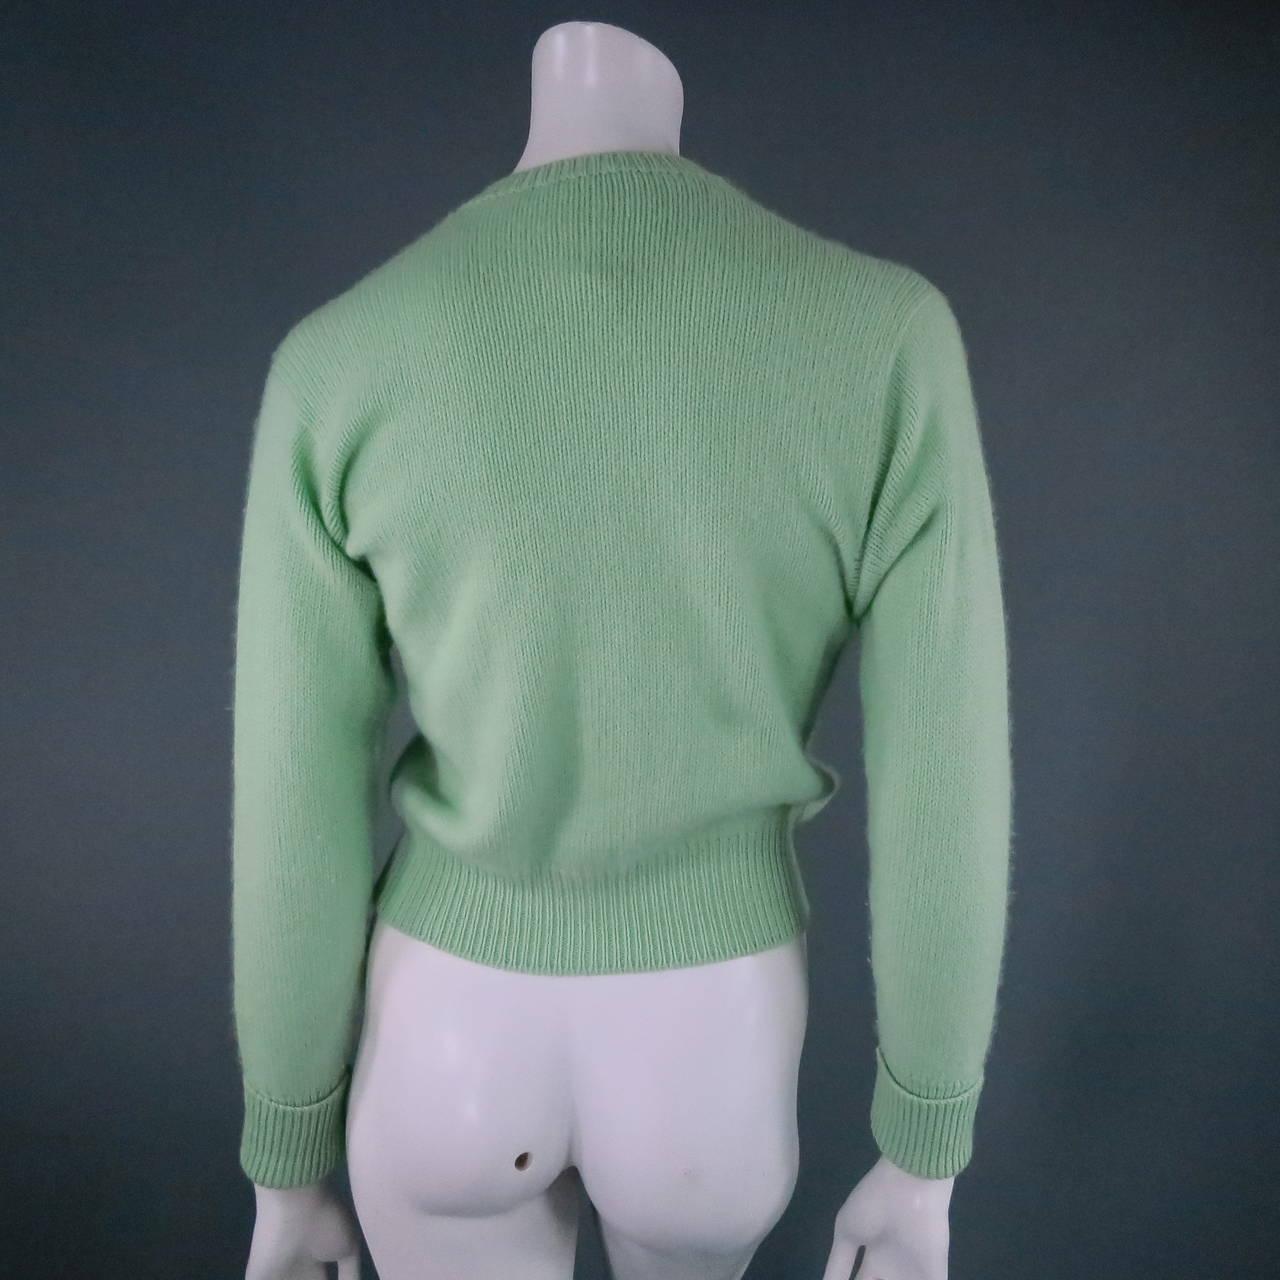 Vintage CHANEL Size M Mint Green Cashmere Cardigan 3